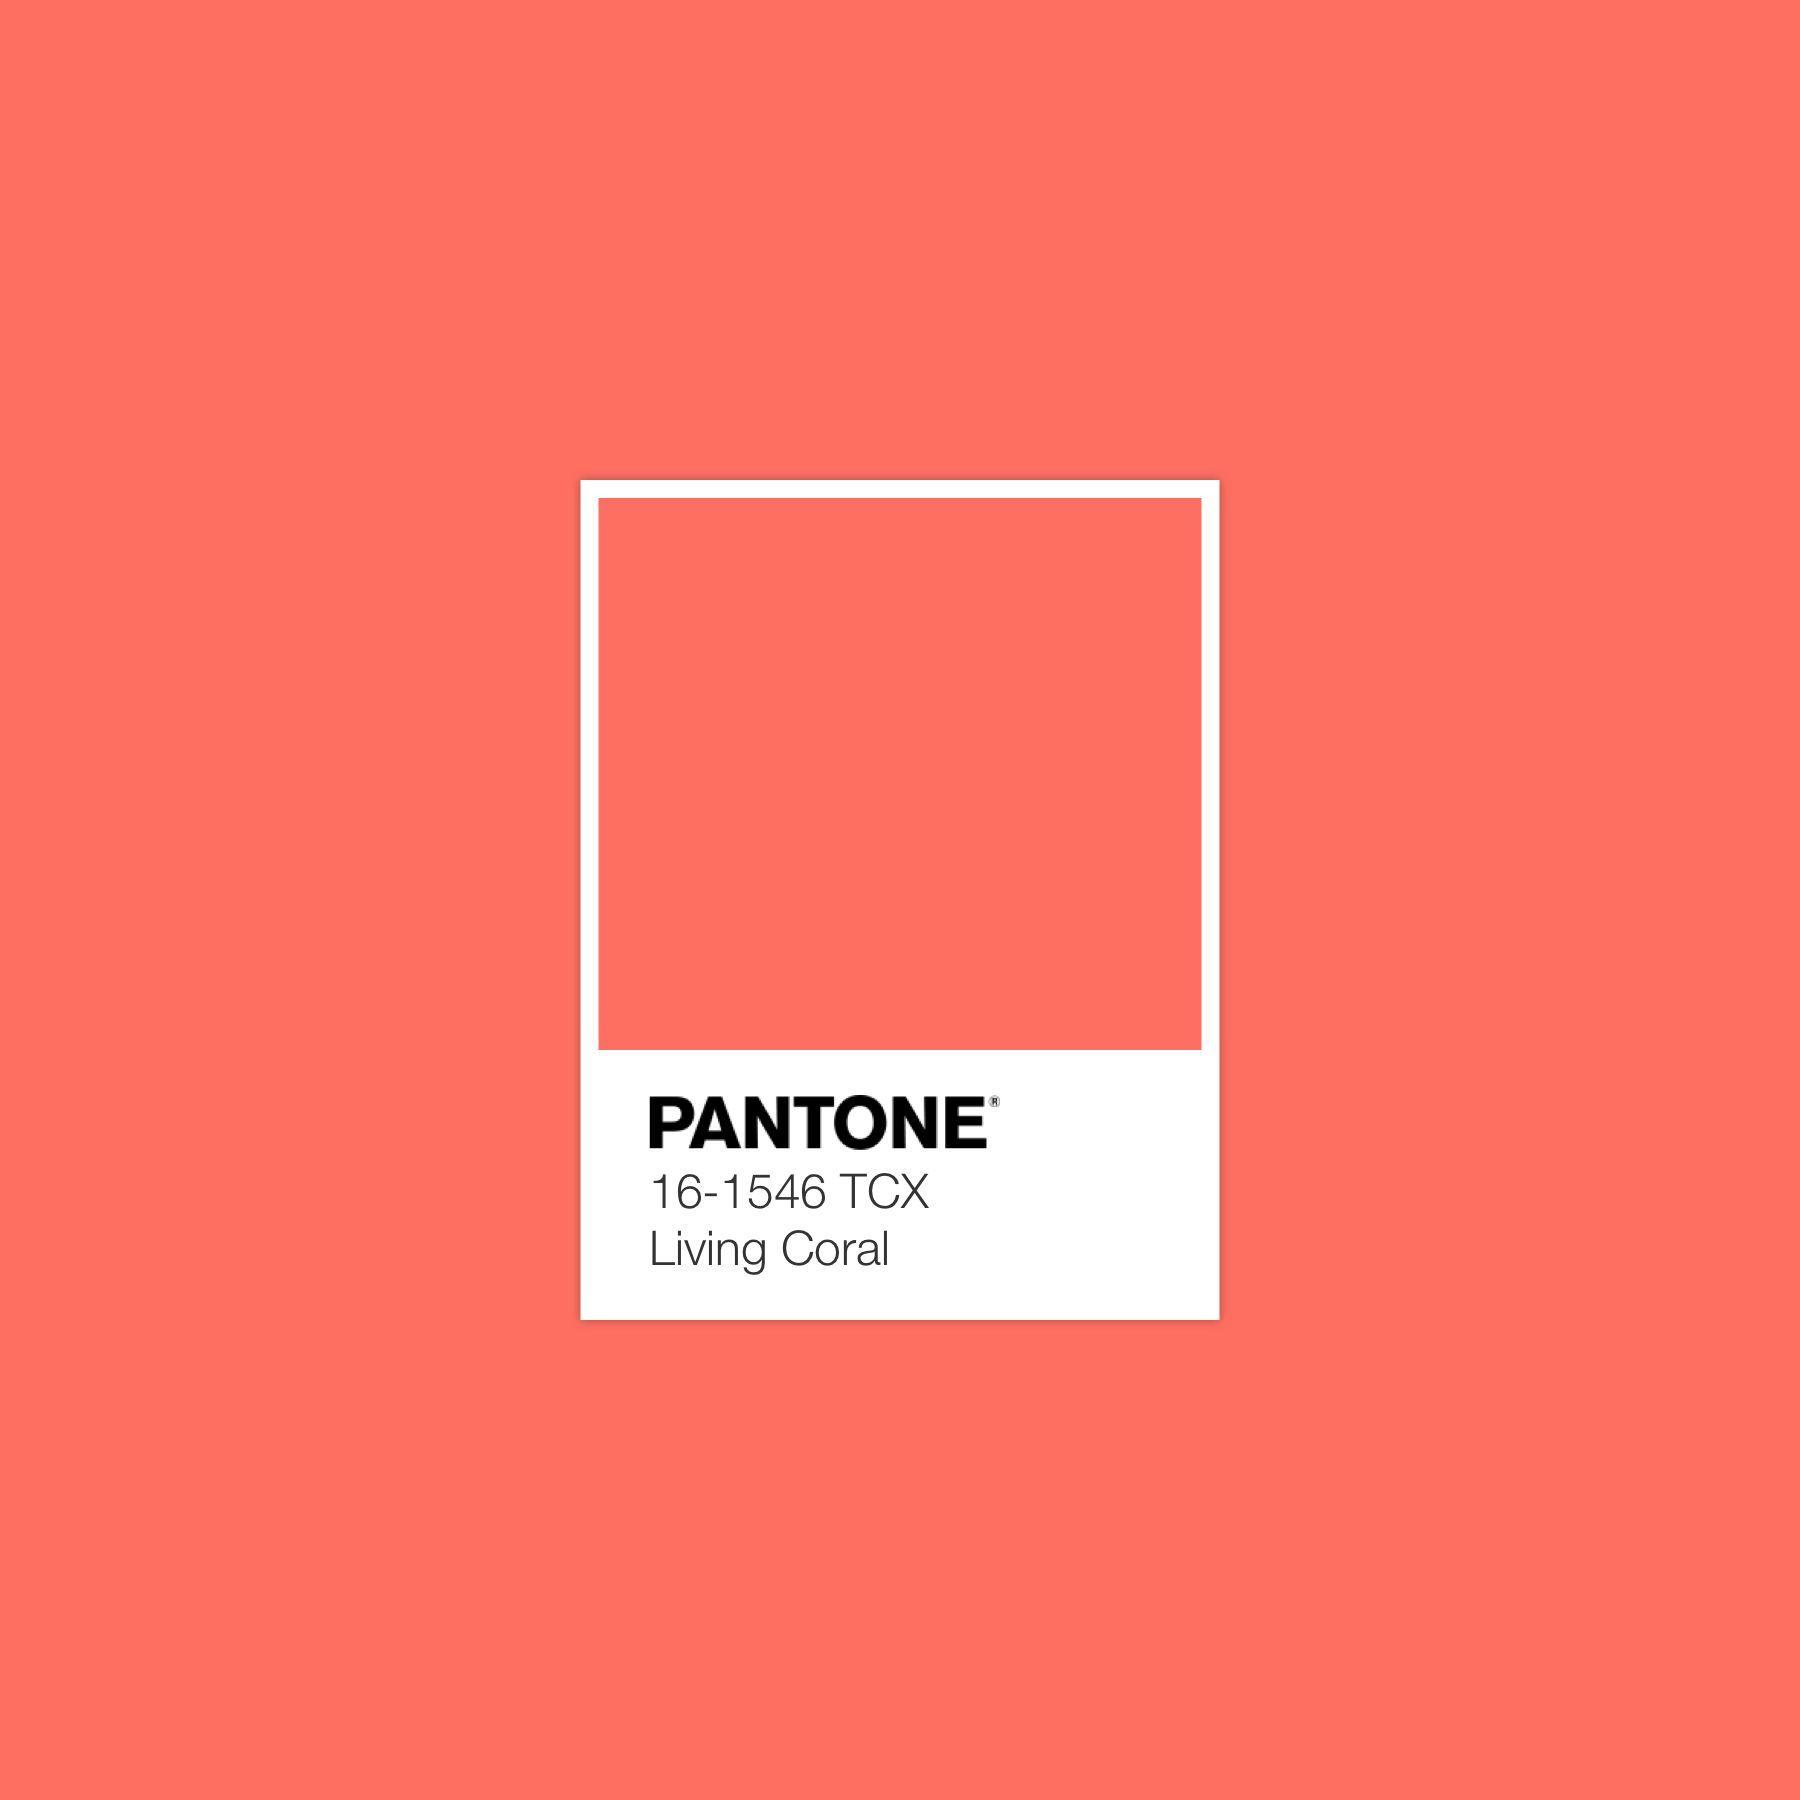 Pantone 2019 Living Coral Color Values: RGB 250 114 104